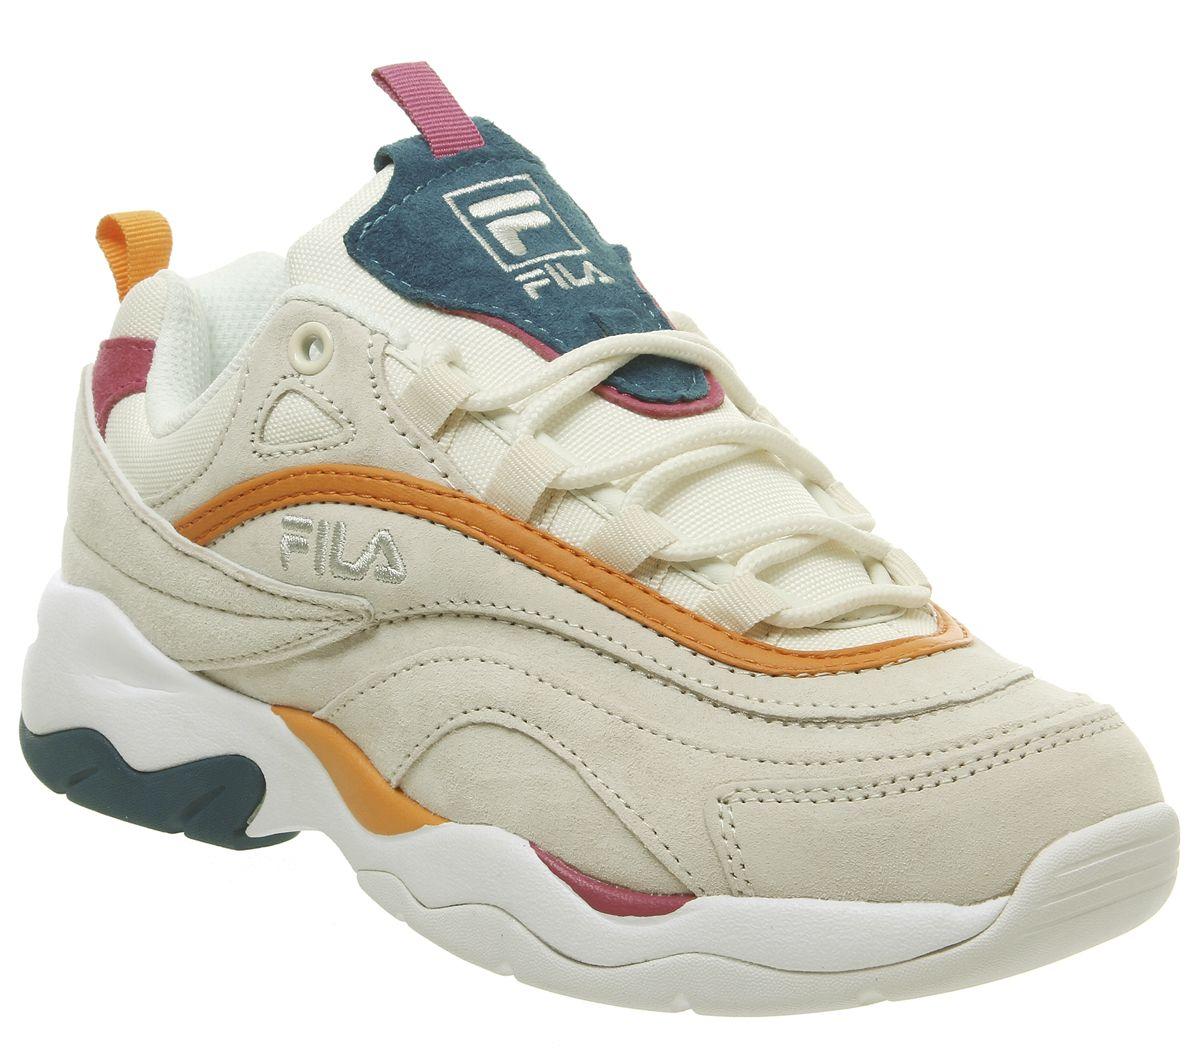 Womens Fila Fila Ray Trainers White Fila Navy Metallic Silver Trainers Shoes